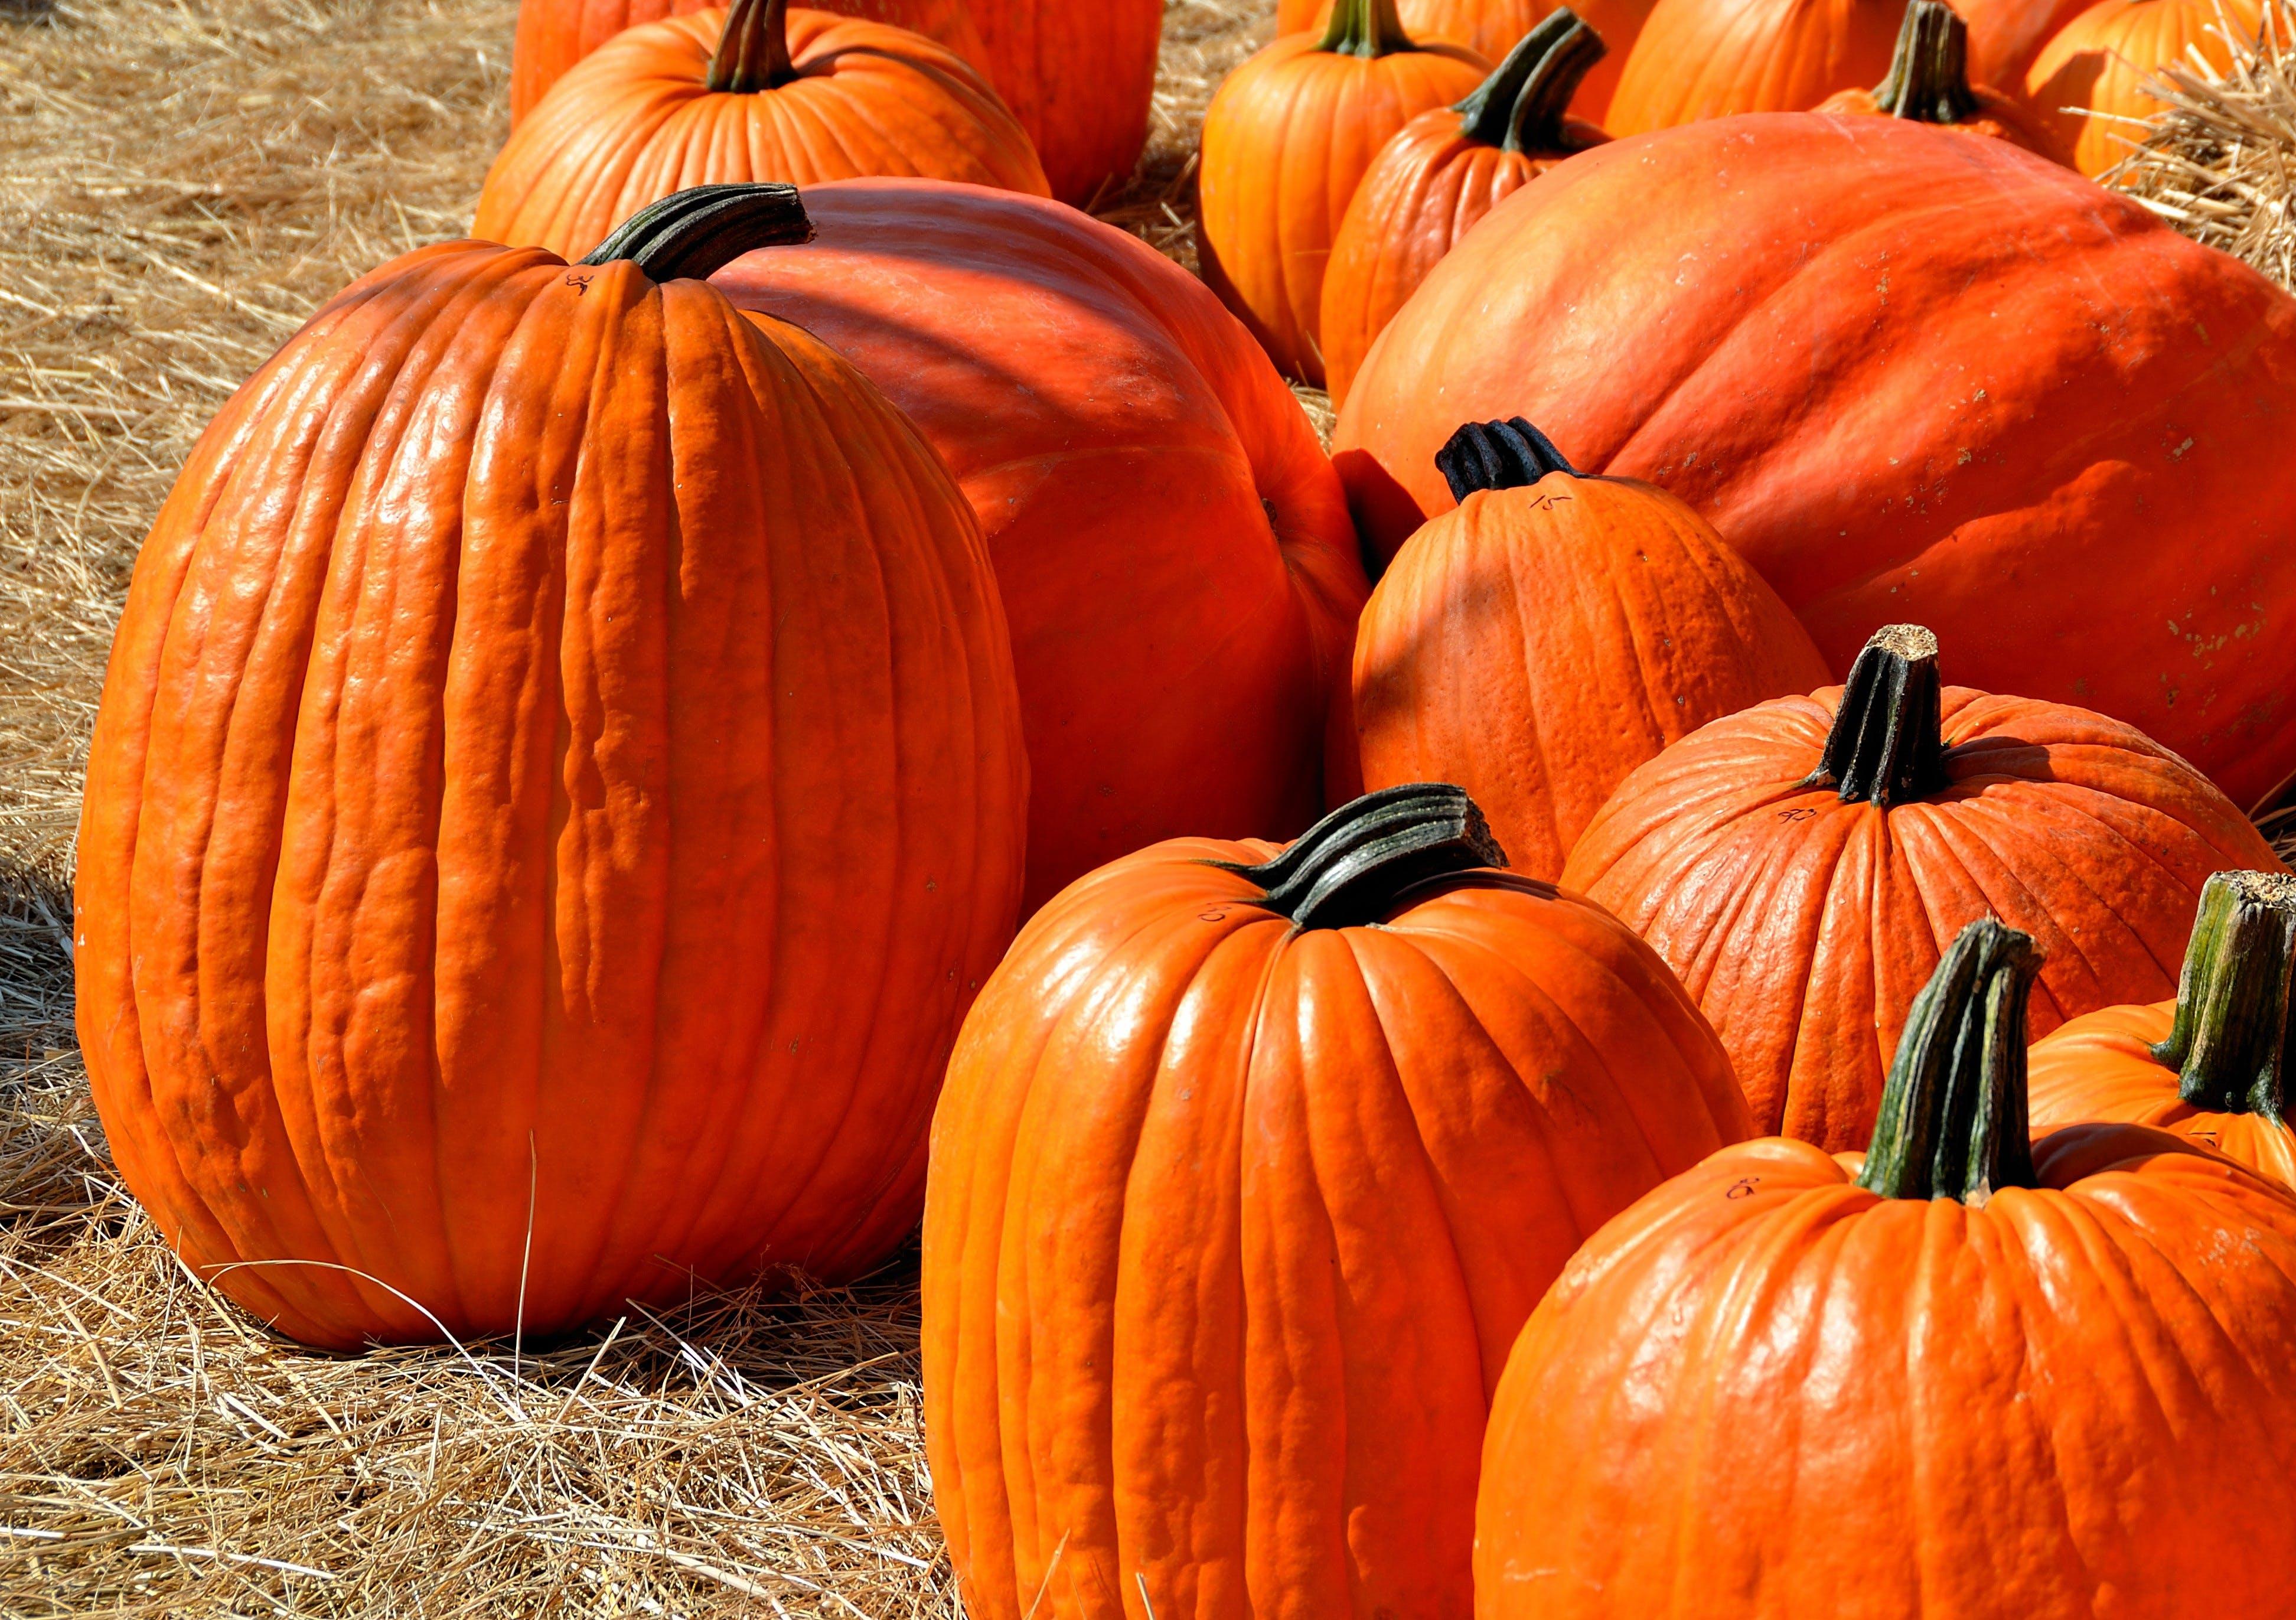 Close Up Photography of Pumpkins